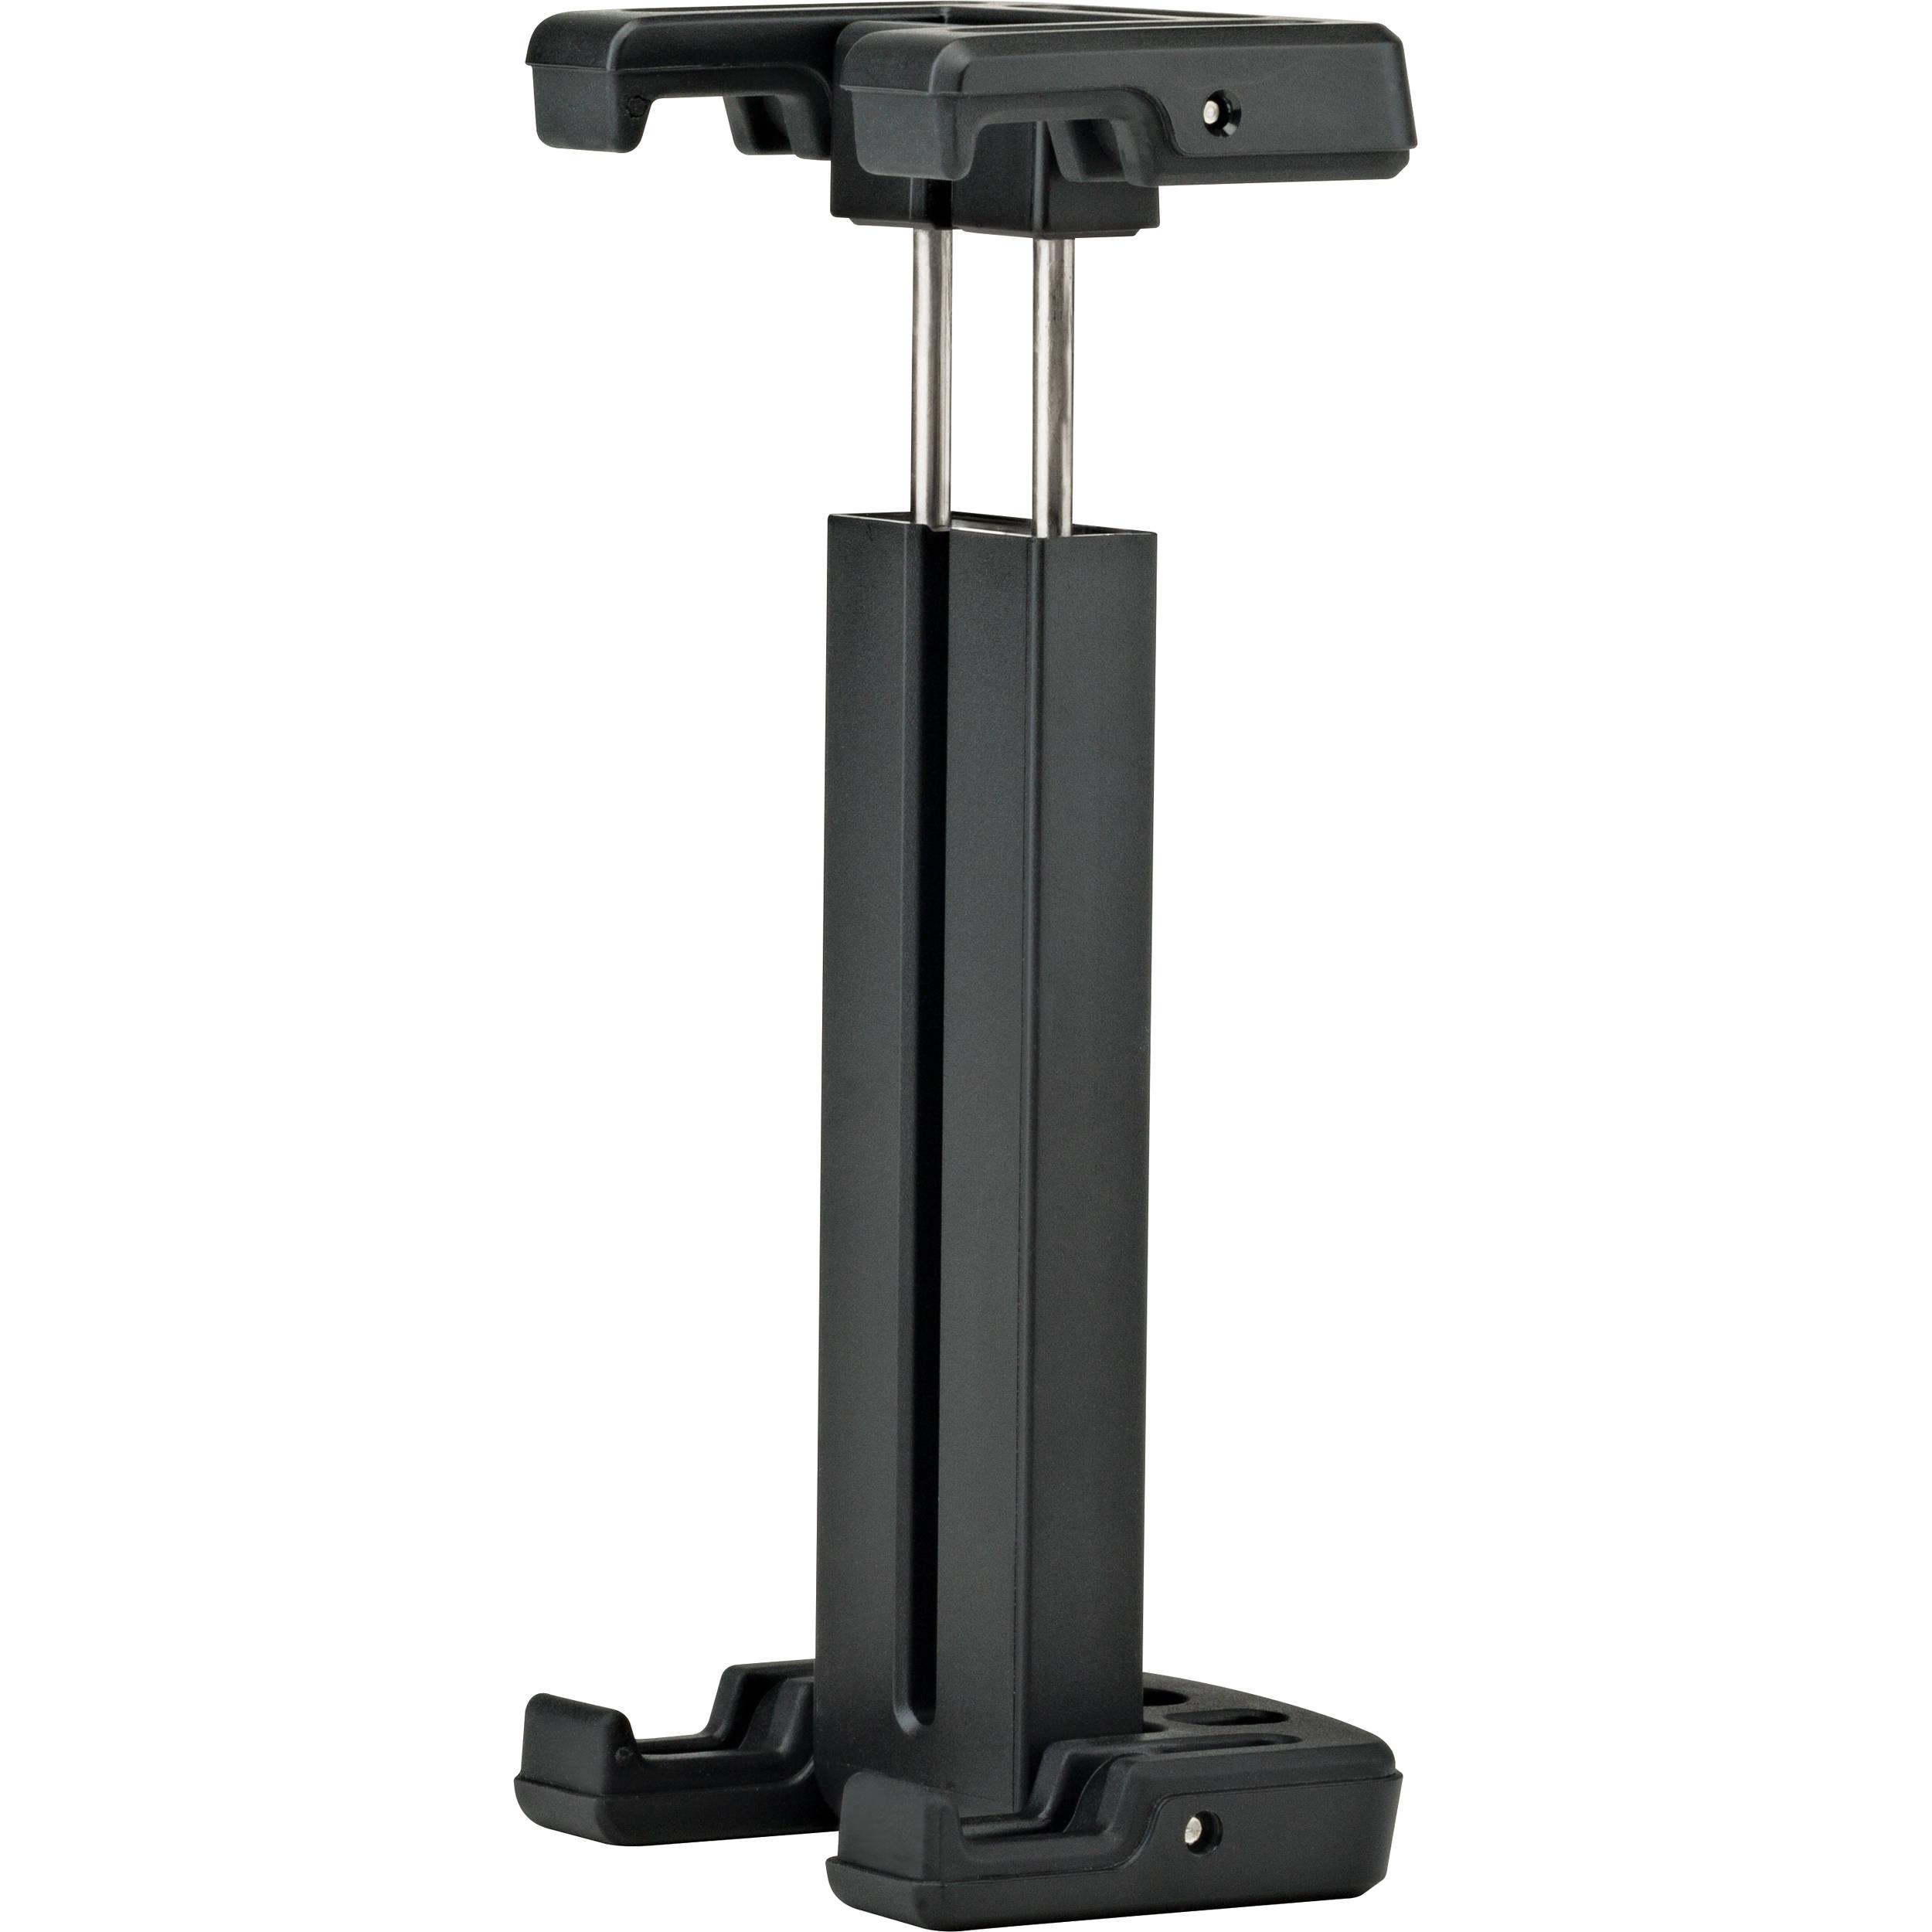 joby griptight mount for smaller tablets - Tablet Mount